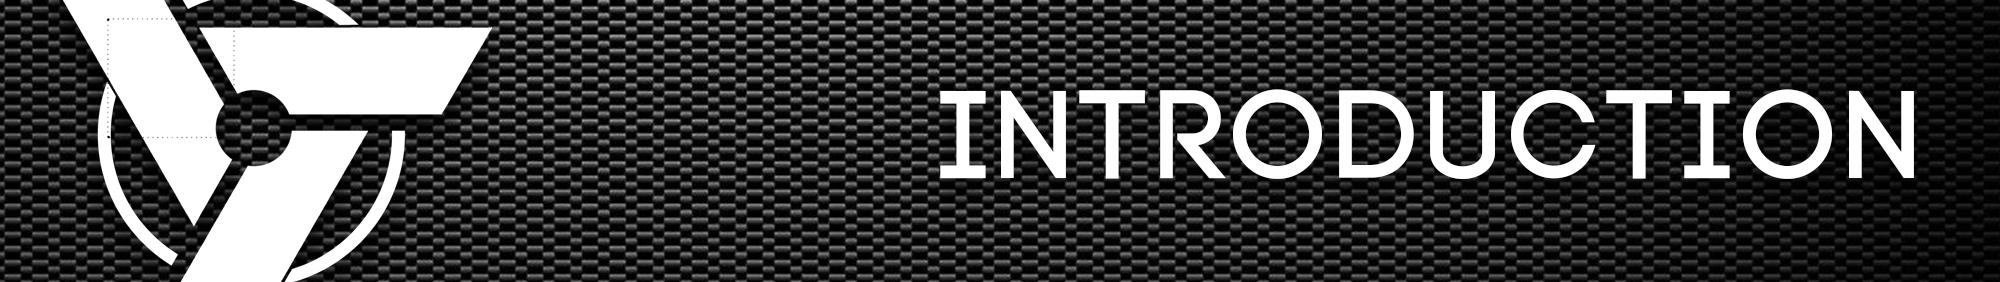 introduction.png.e7804701b3e649ac0b54d9ac134dfa42.png